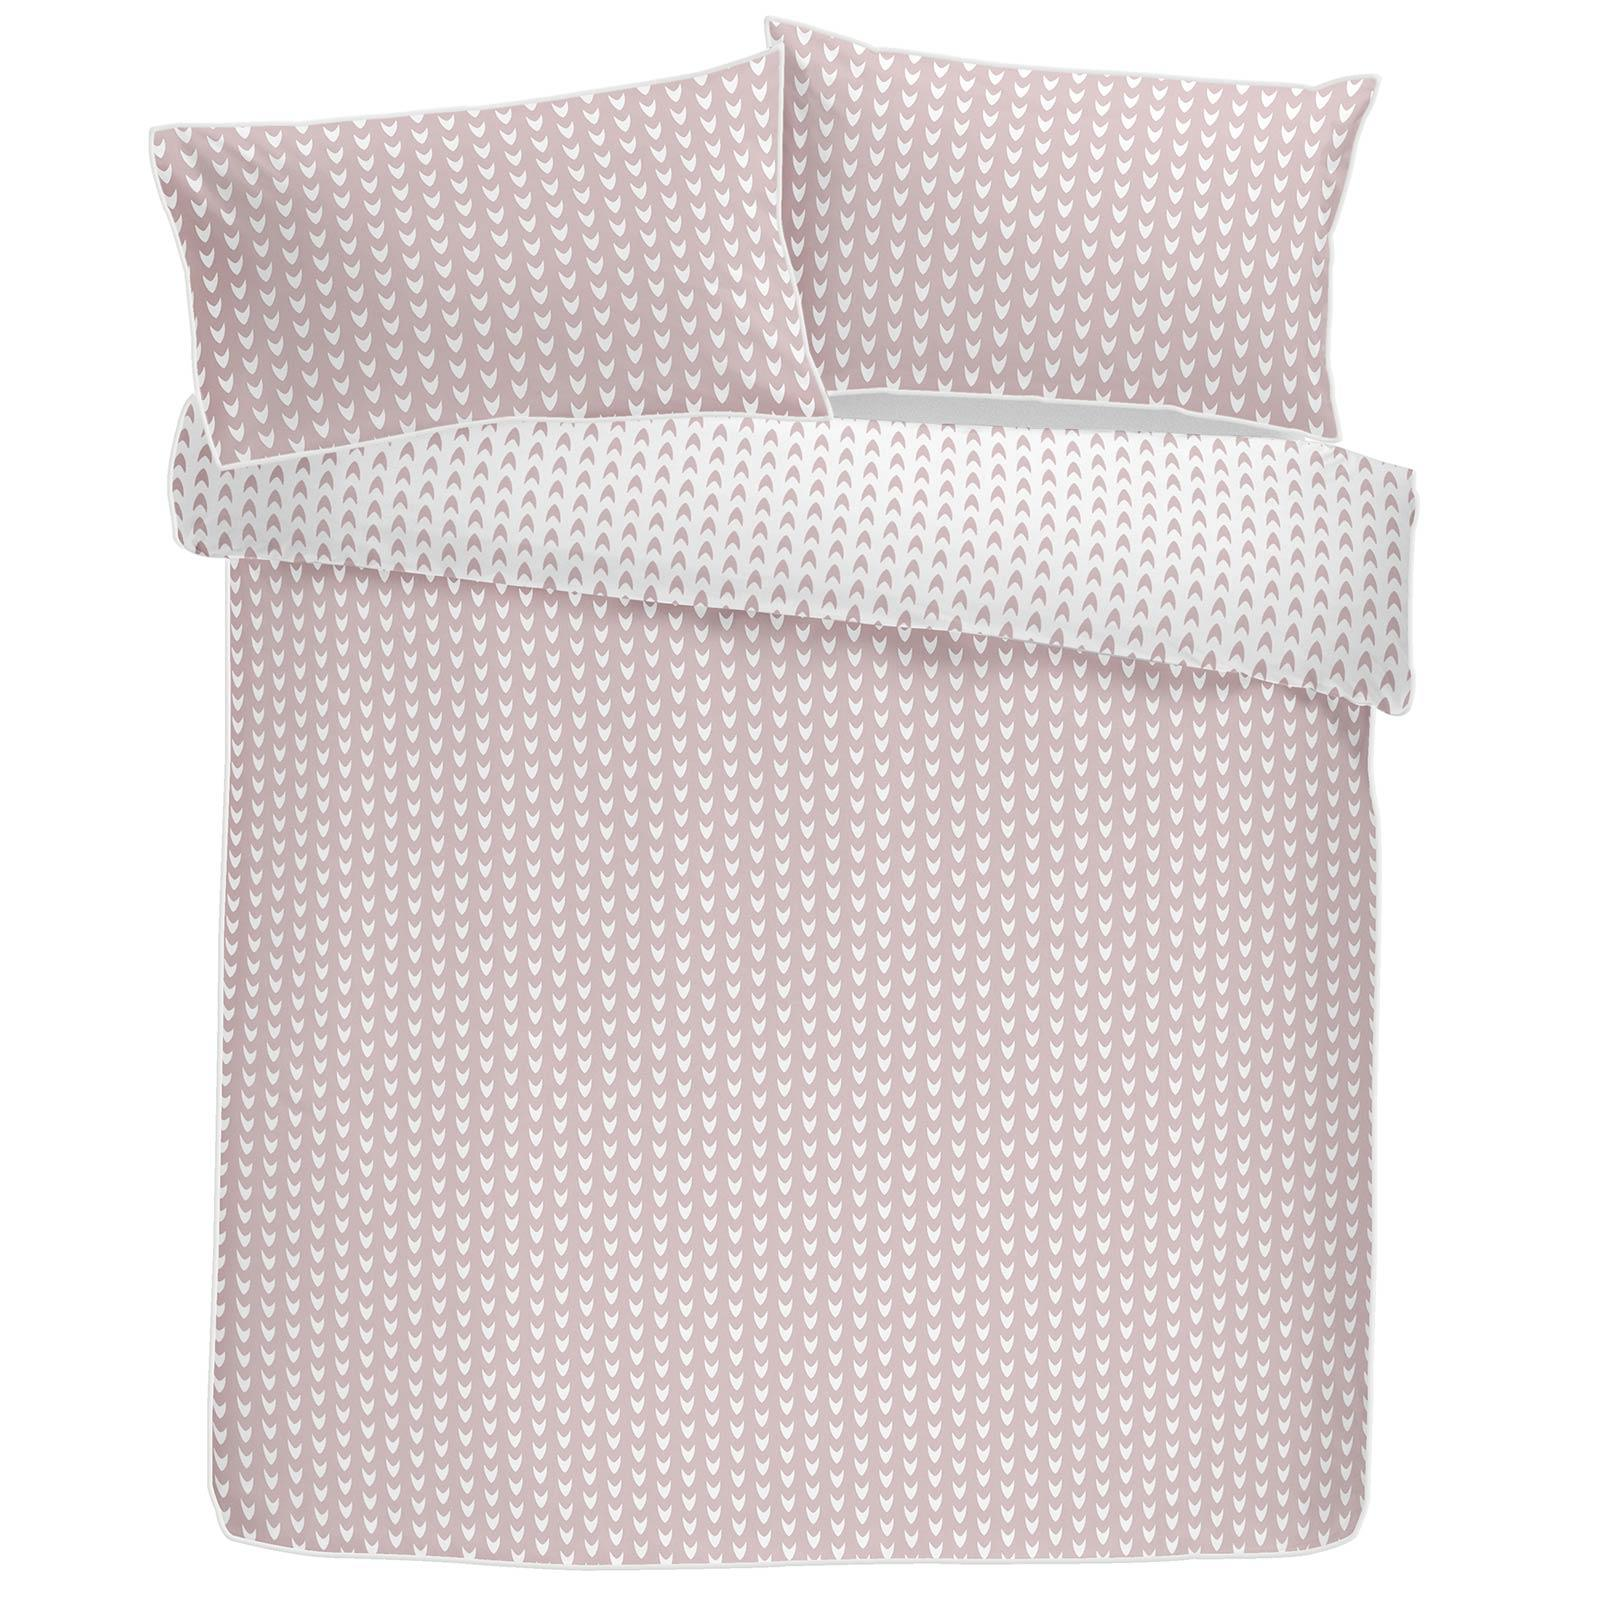 Blush-fundas-nordicas-Rosa-Geometrico-100-Algodon-Edredon-Reversible-conjuntos-de-cama miniatura 9